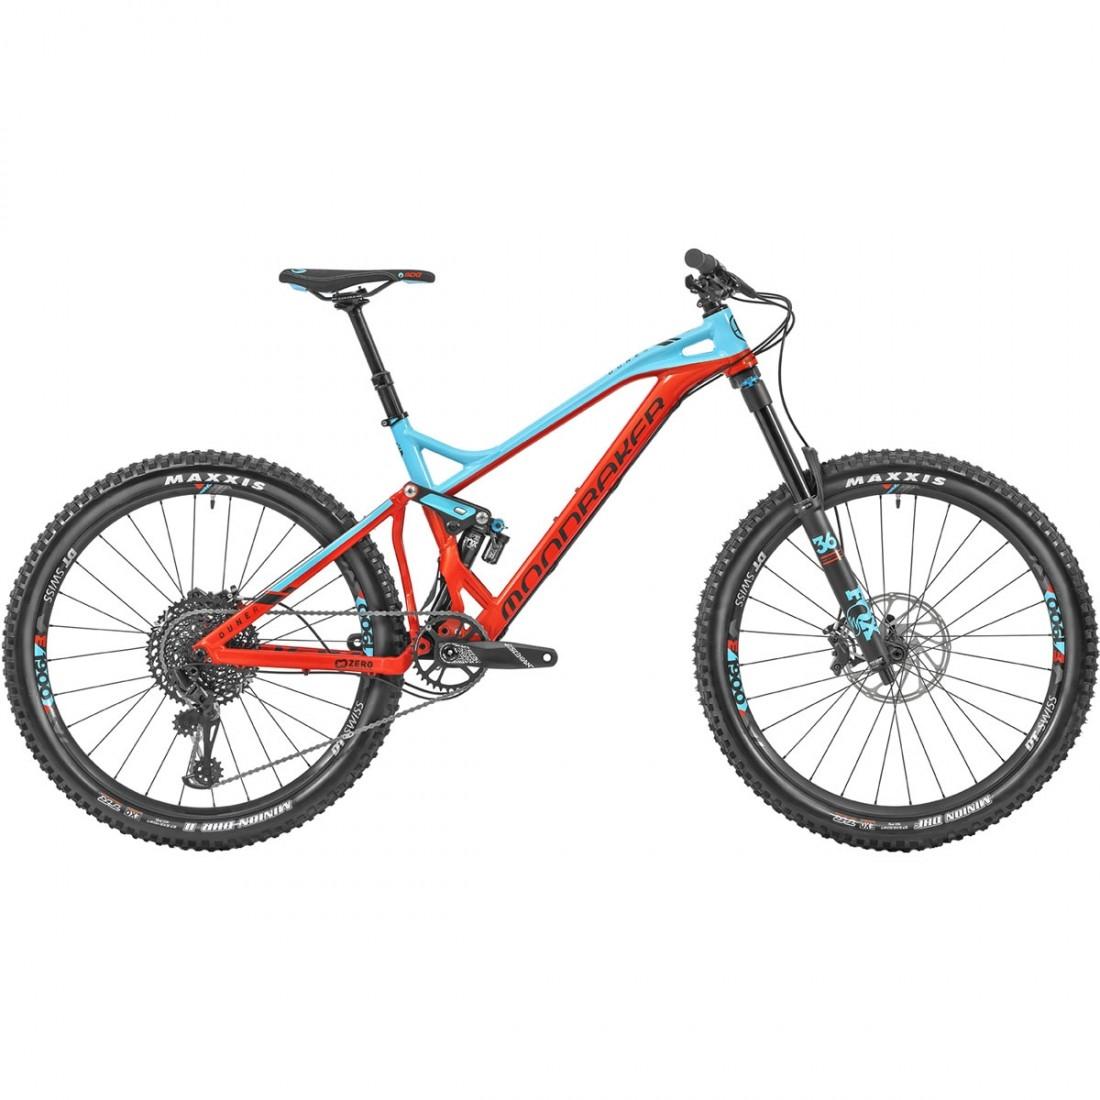 "4c9bd9f8a Bicicleta de montaña MONDRAKER Dune R 27.5"" 2019 Flame Red / Blue Sky"